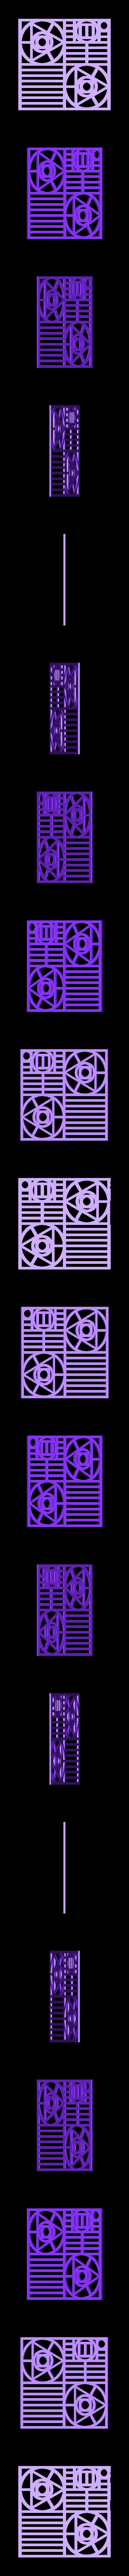 80x80_1.stl Download free STL file Subdivided Surfaces • 3D printing design, ferjerez3d